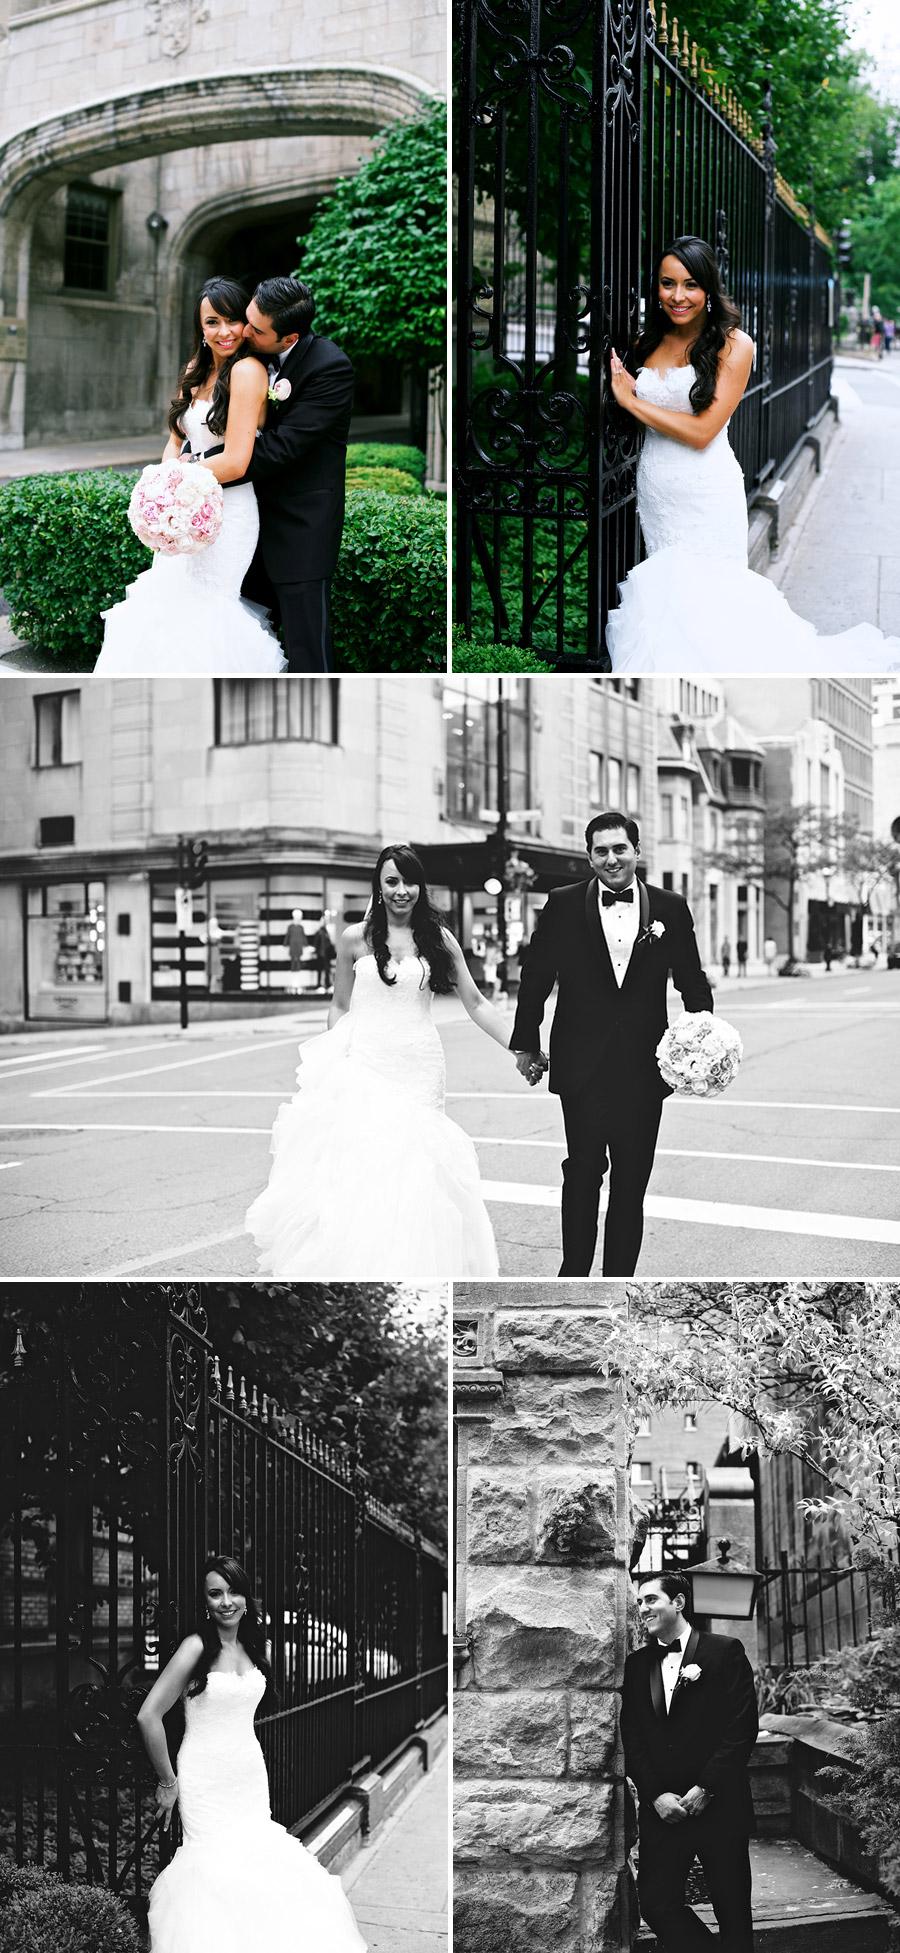 Blog-Collage-1409513357695.jpg